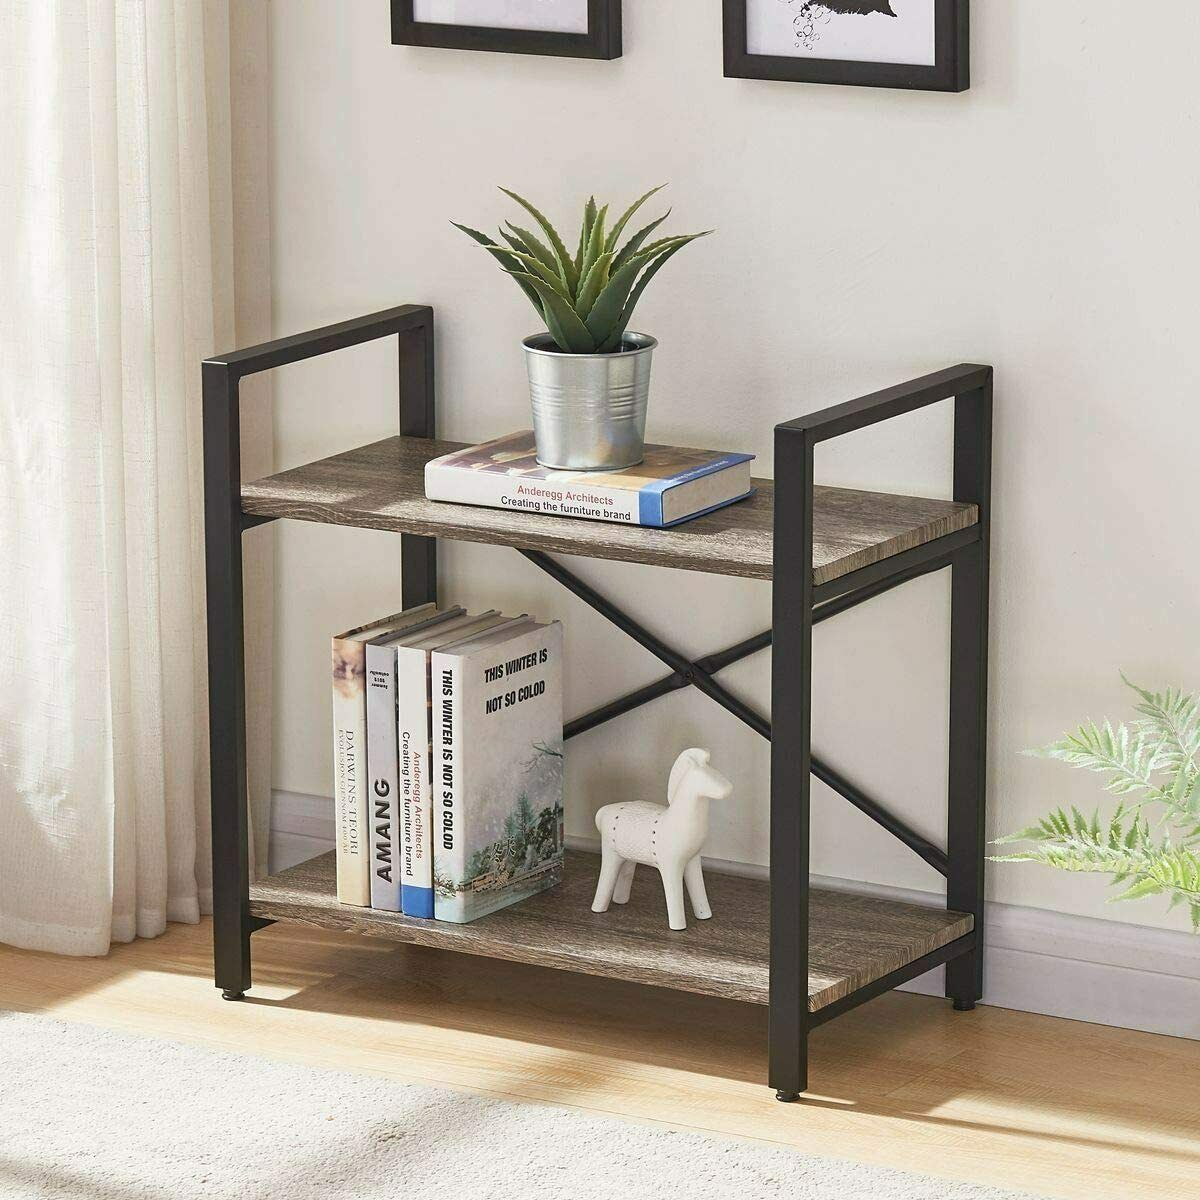 2 Tier Bookshelf Narrow Modern Wood Bookcase Small Kitchen Shelf For Storage 713091555884 Ebay